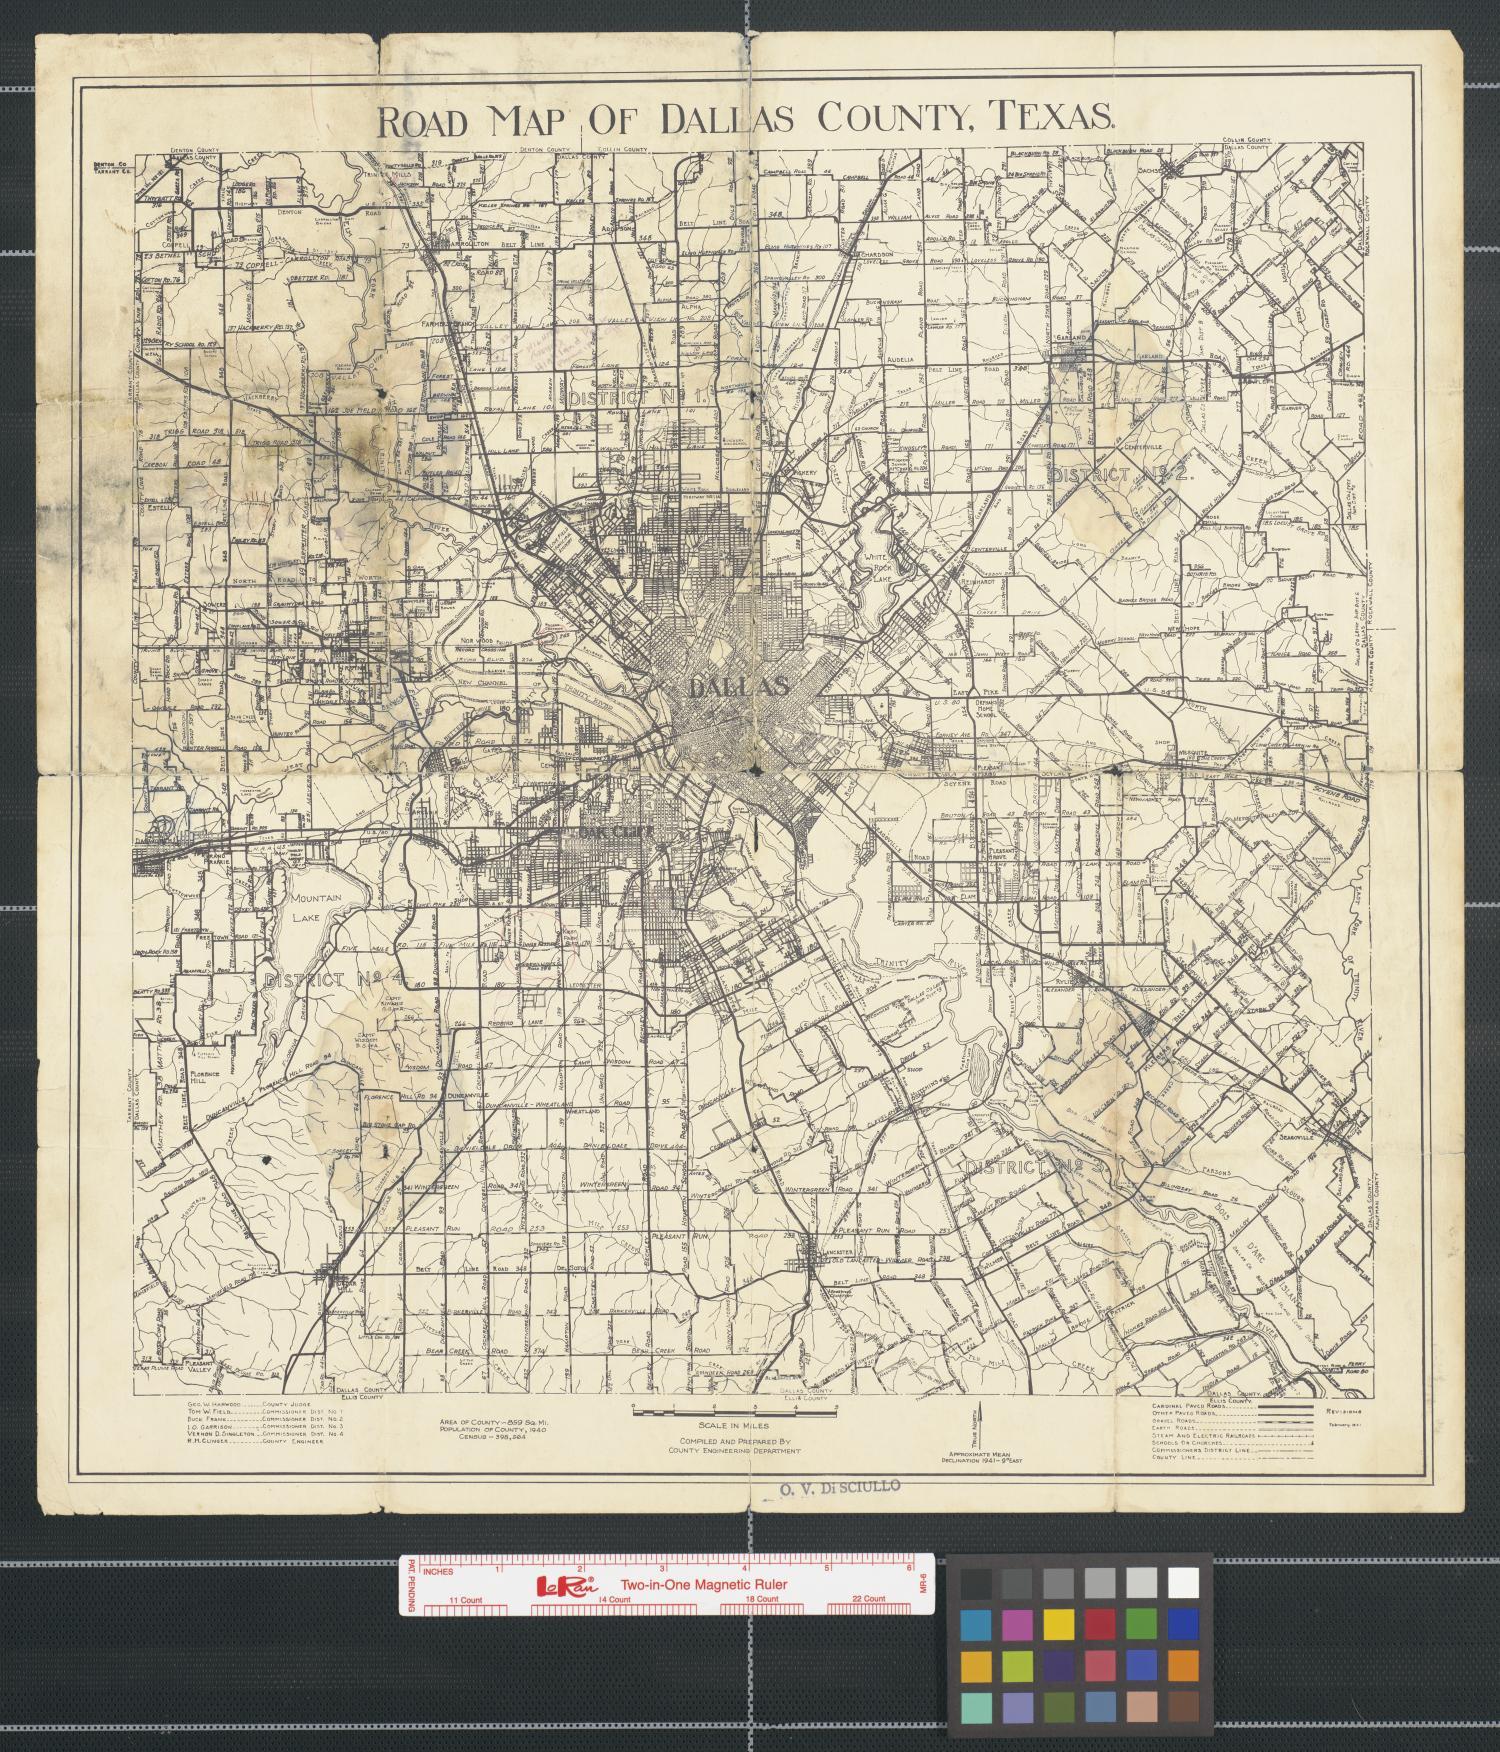 Arlington Tx News >> Road Map of Dallas County, Texas - The Portal to Texas History